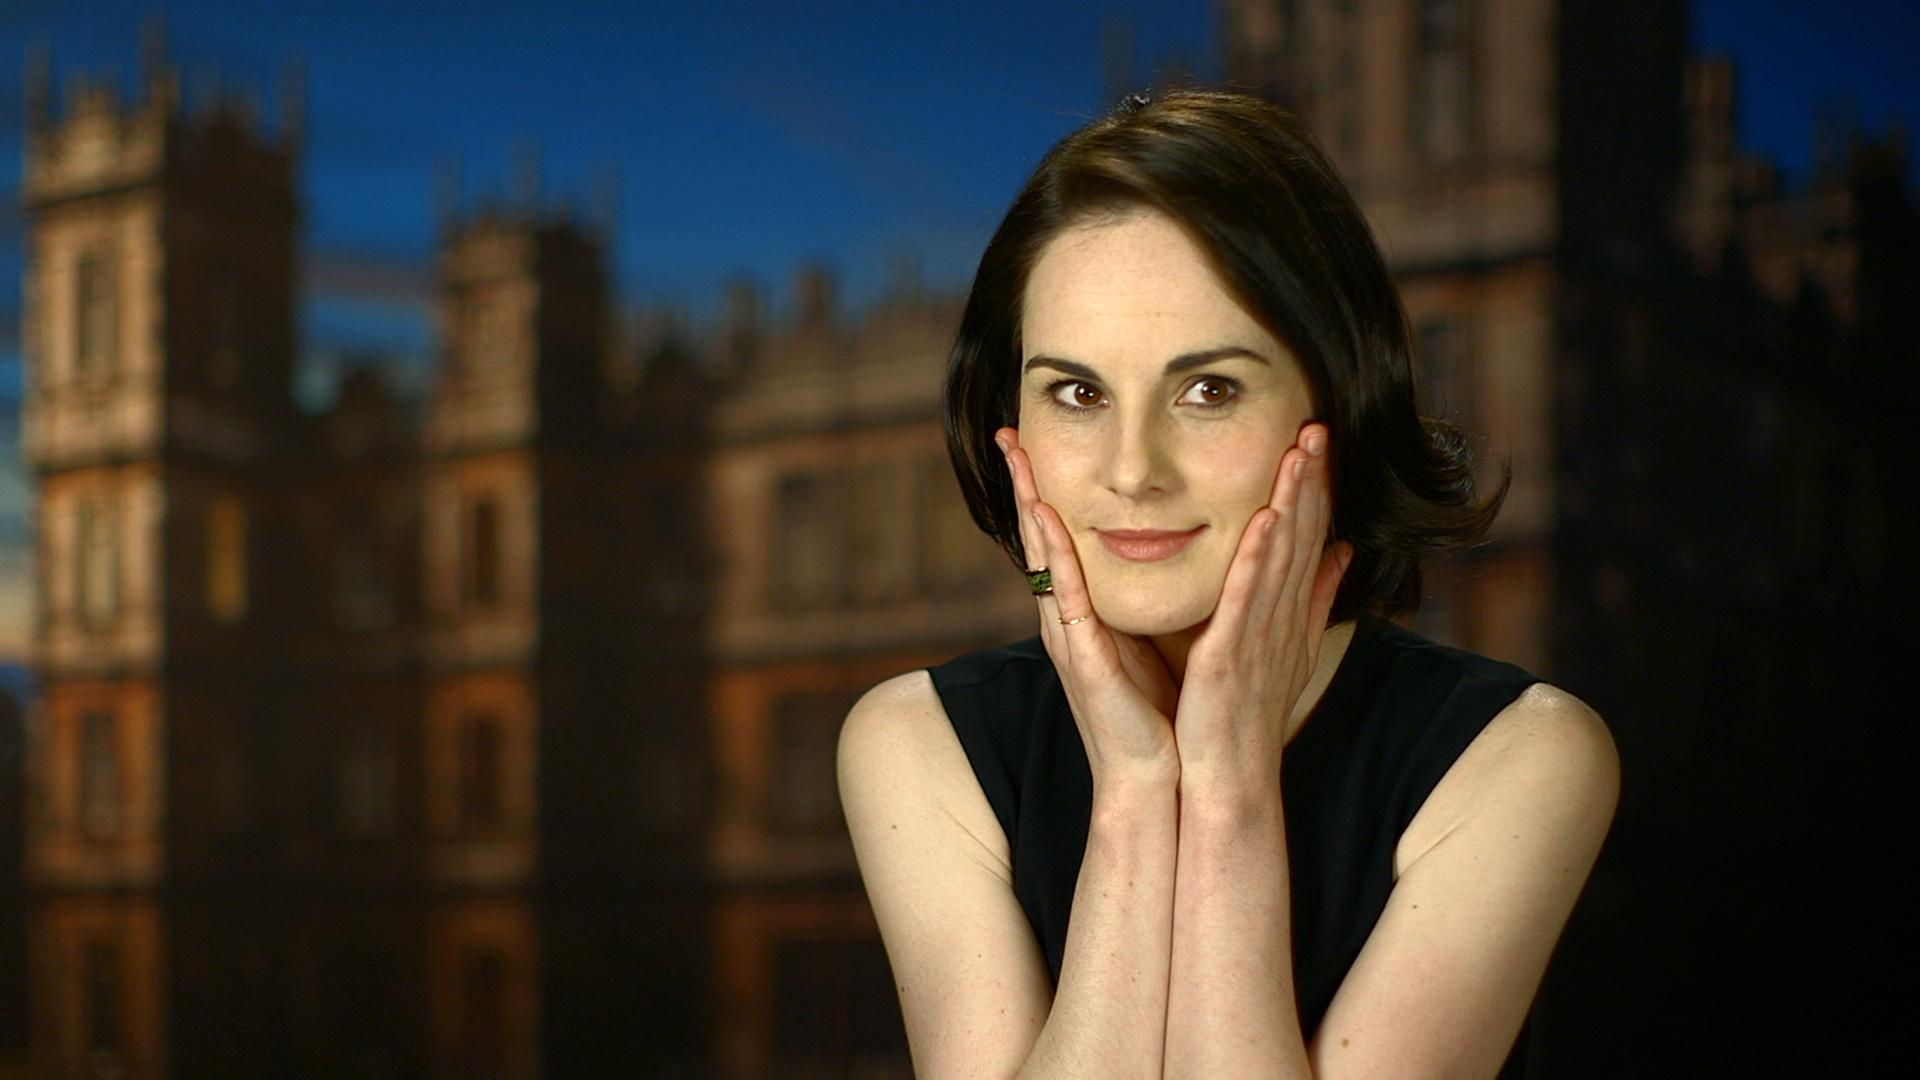 Downton Abbey, Season 4: Behind the Scenes image